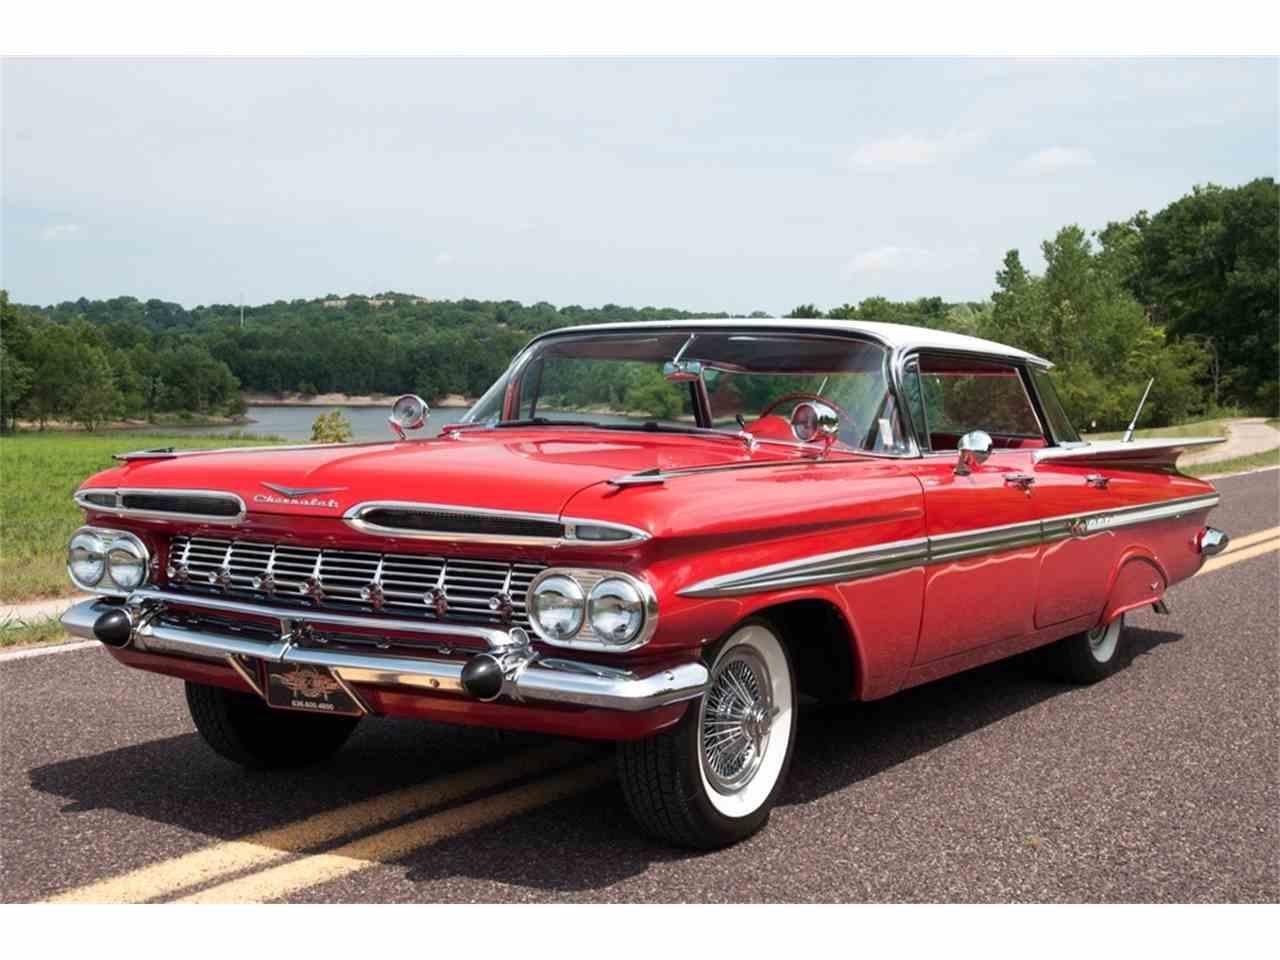 1959 chevrolet impala for sale cc 1000697. Black Bedroom Furniture Sets. Home Design Ideas